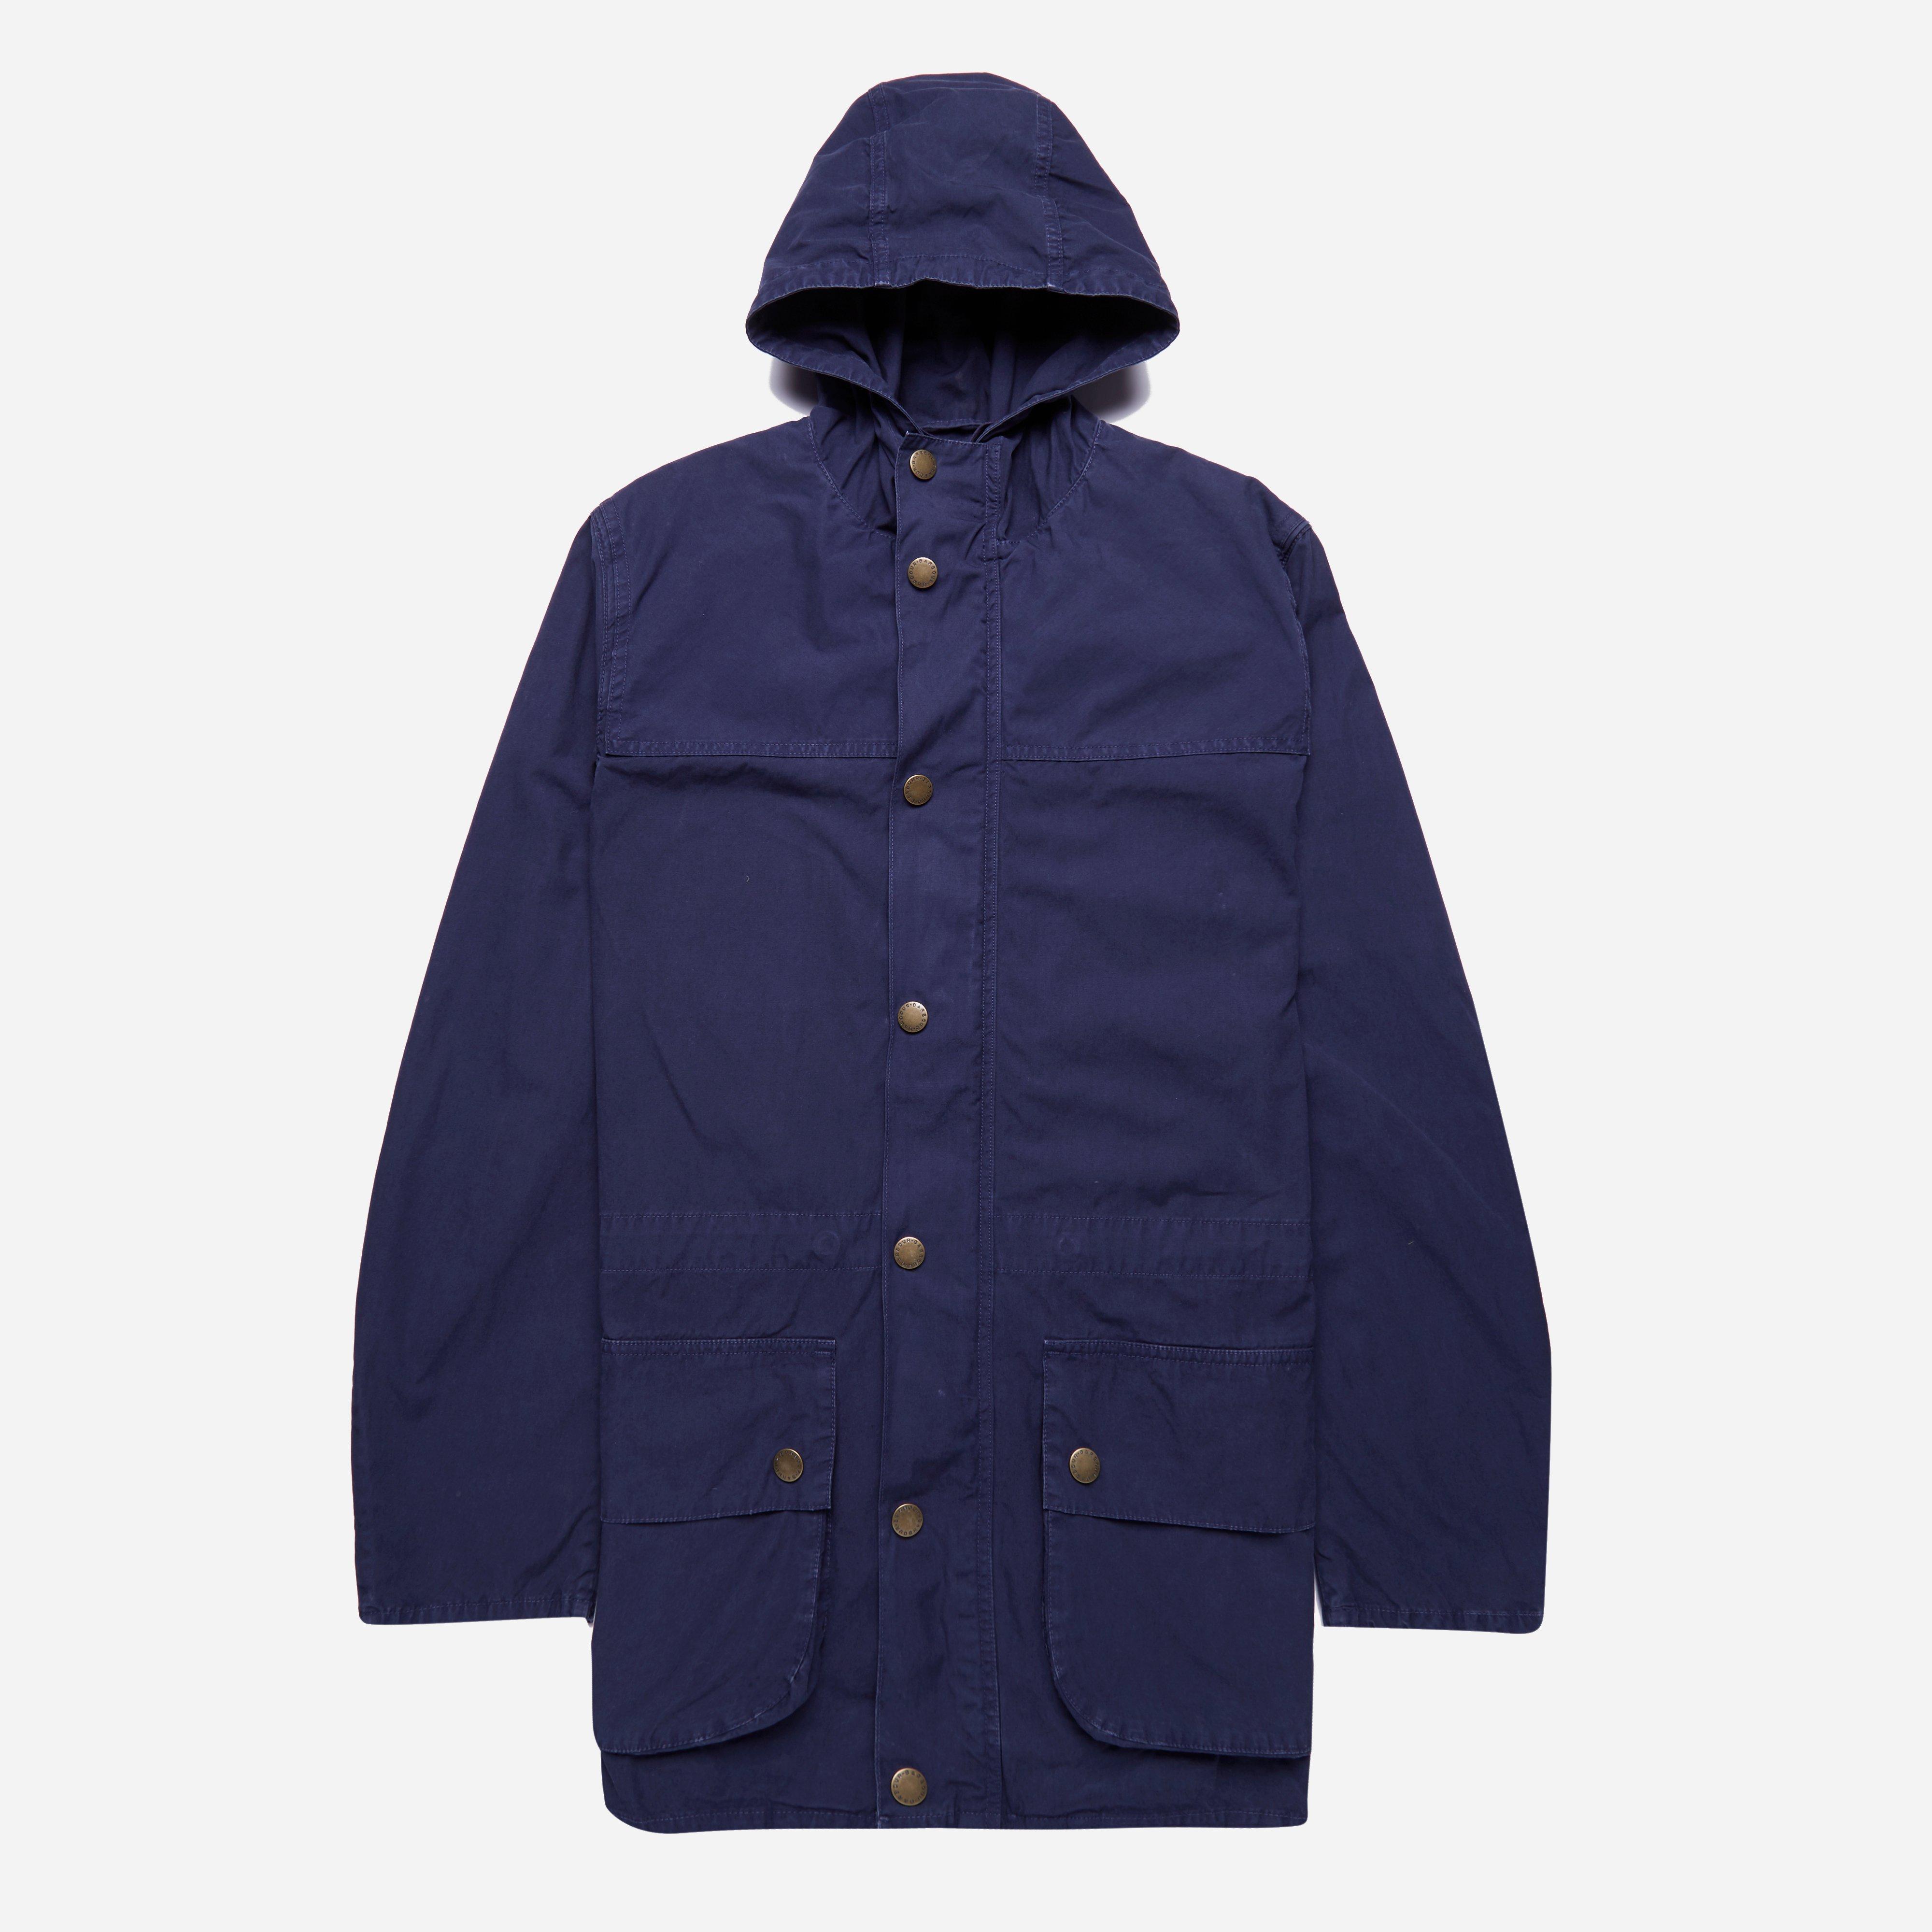 Barbour Japan Overdyed SL Durham Jacket